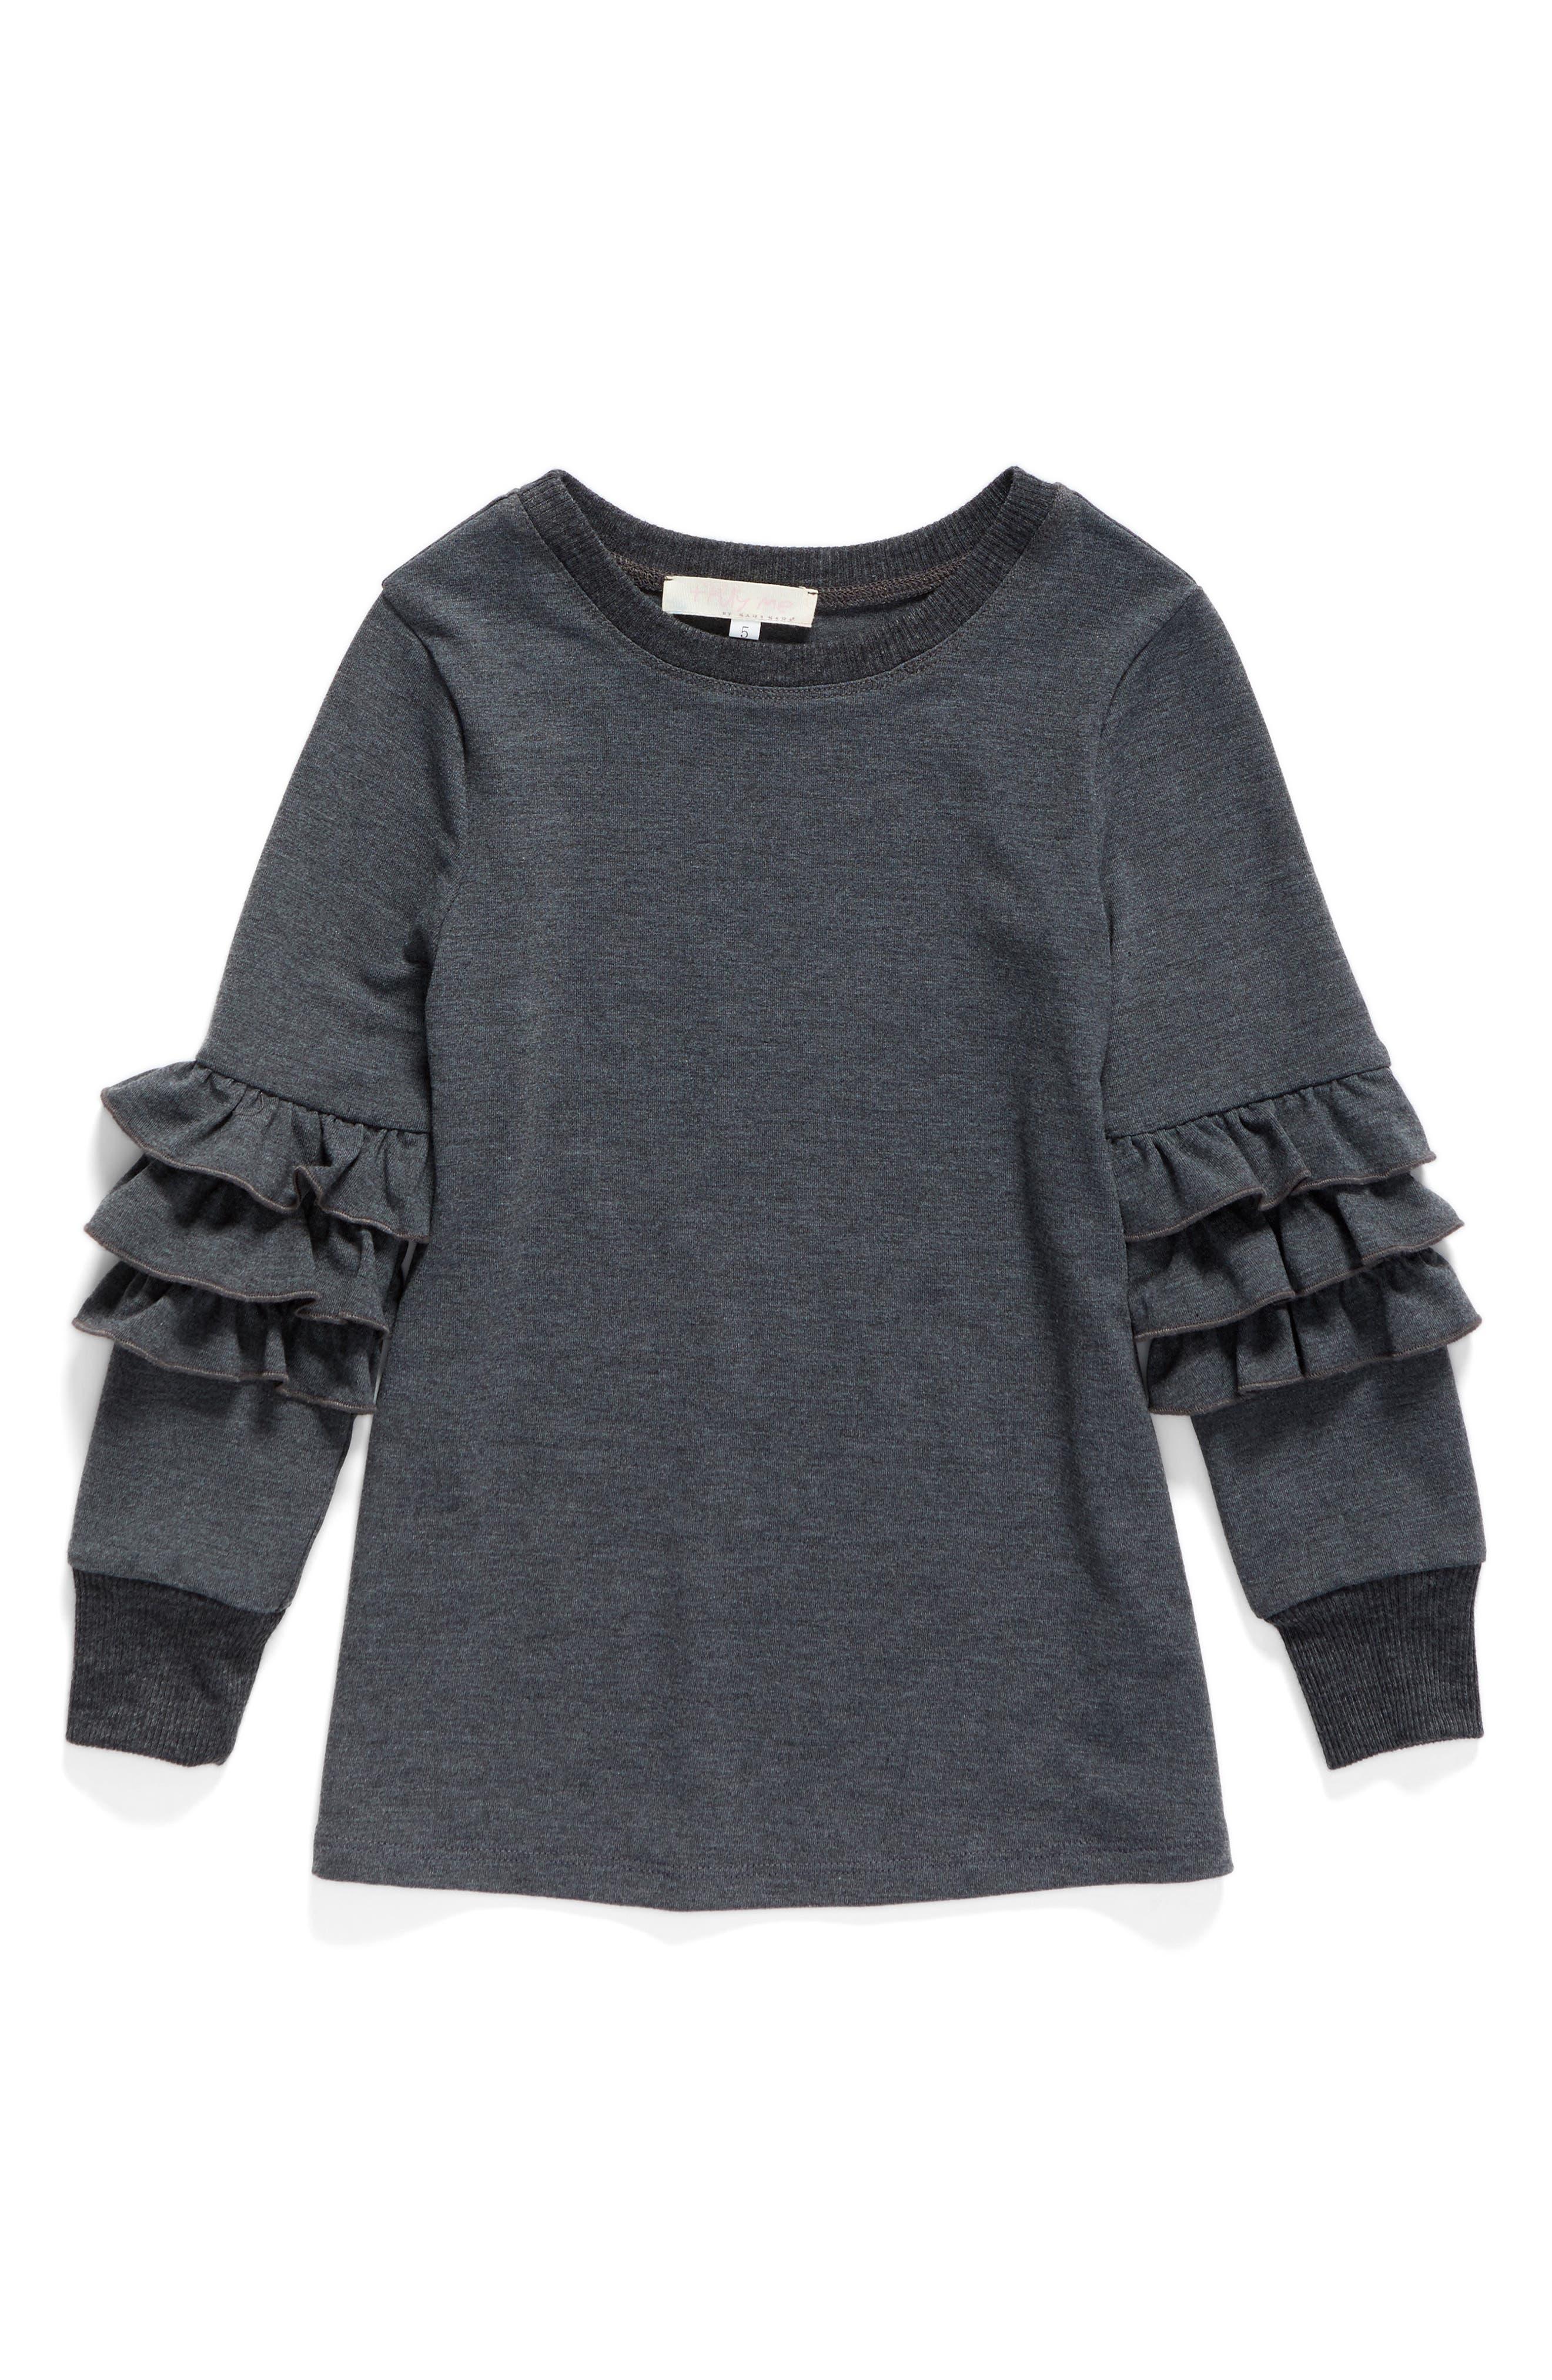 Ruffle Sleeve Sweatshirt,                         Main,                         color, Charcoal